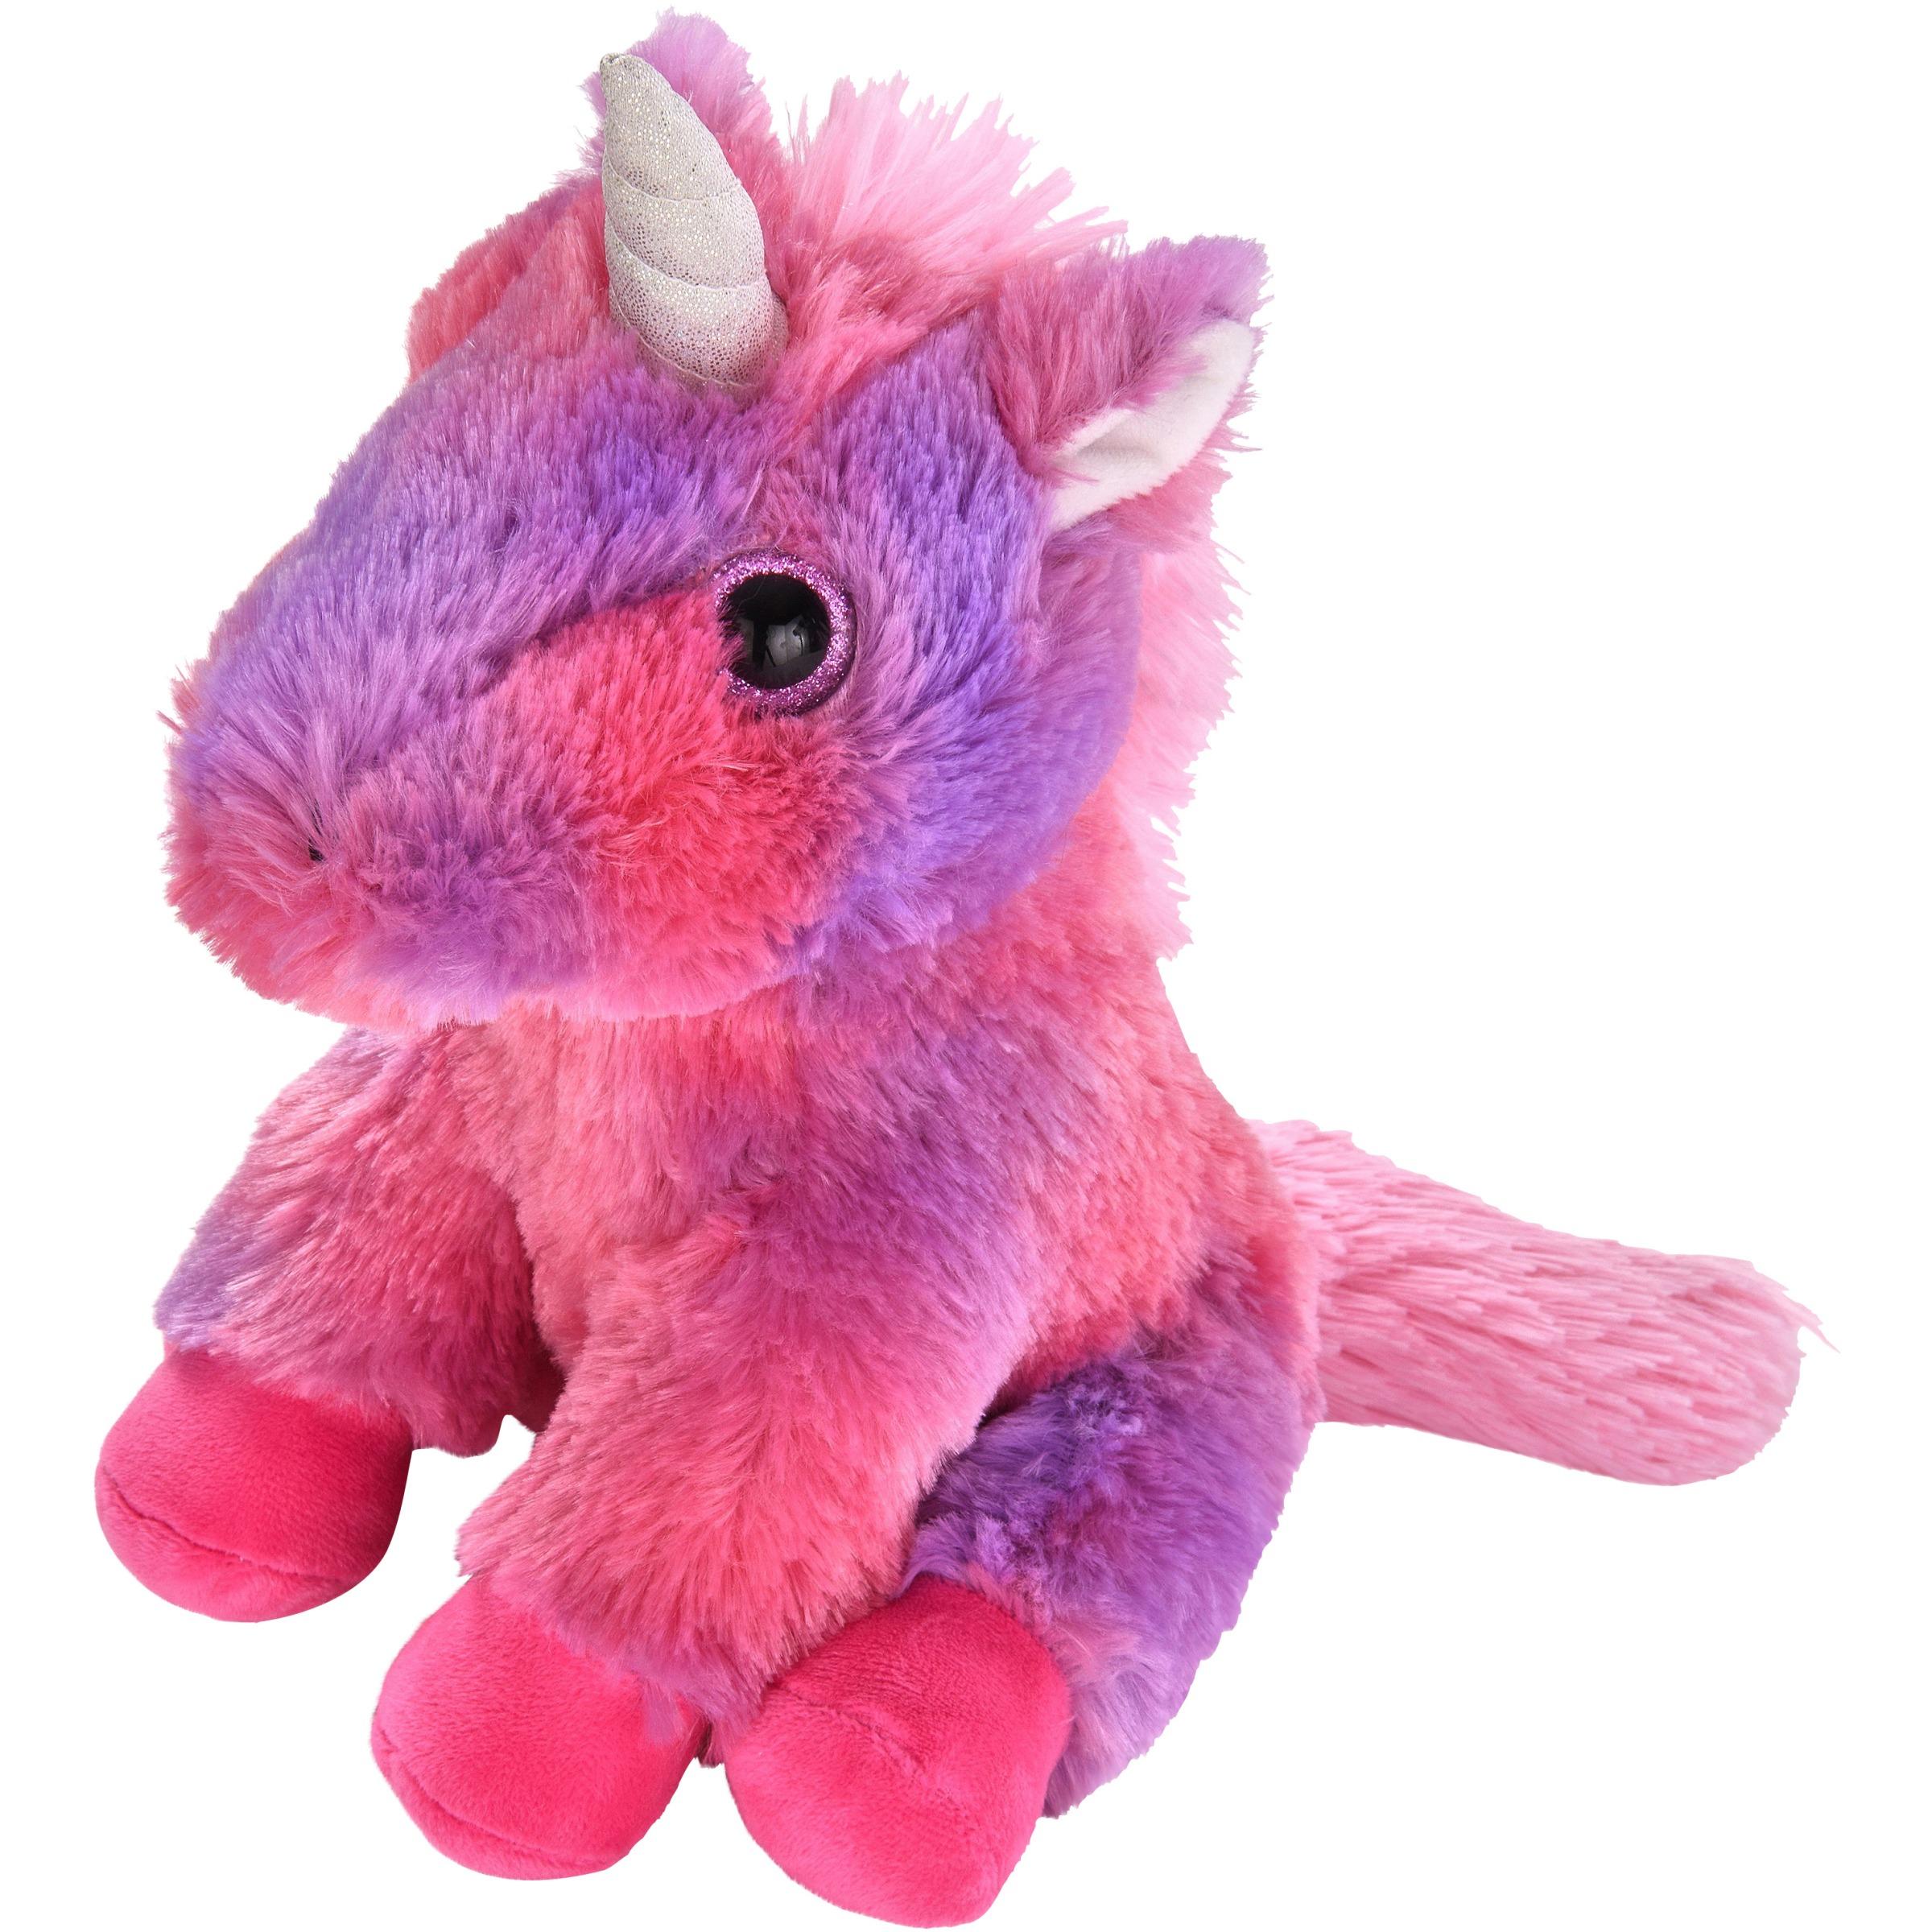 "Spark Create Imagine Plush 9"" Bright Eye Unicorn, Purple"